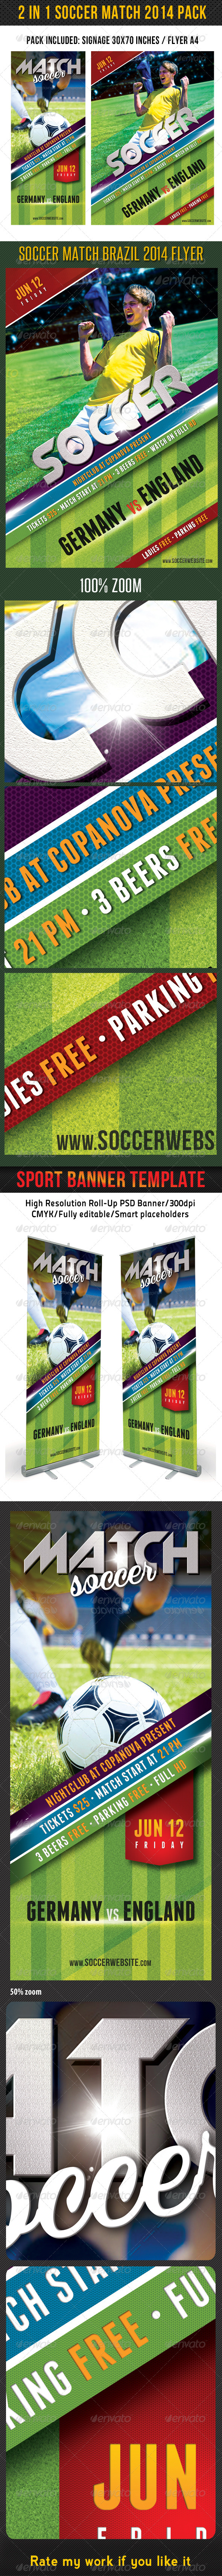 GraphicRiver Soccer Tournament 2014 Pack V3 7867534